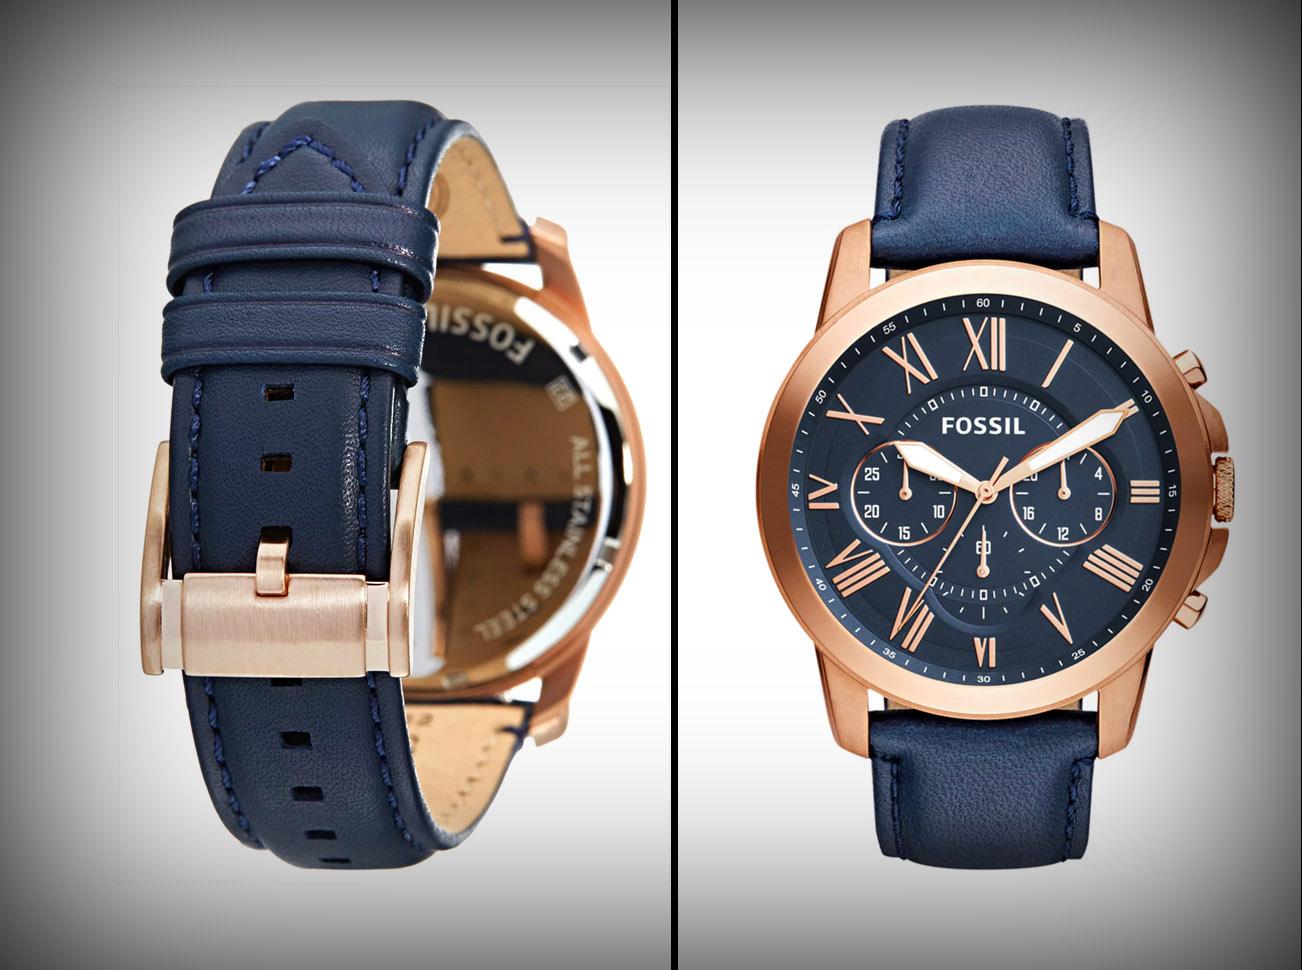 betaalbare, luxe horloges fossil